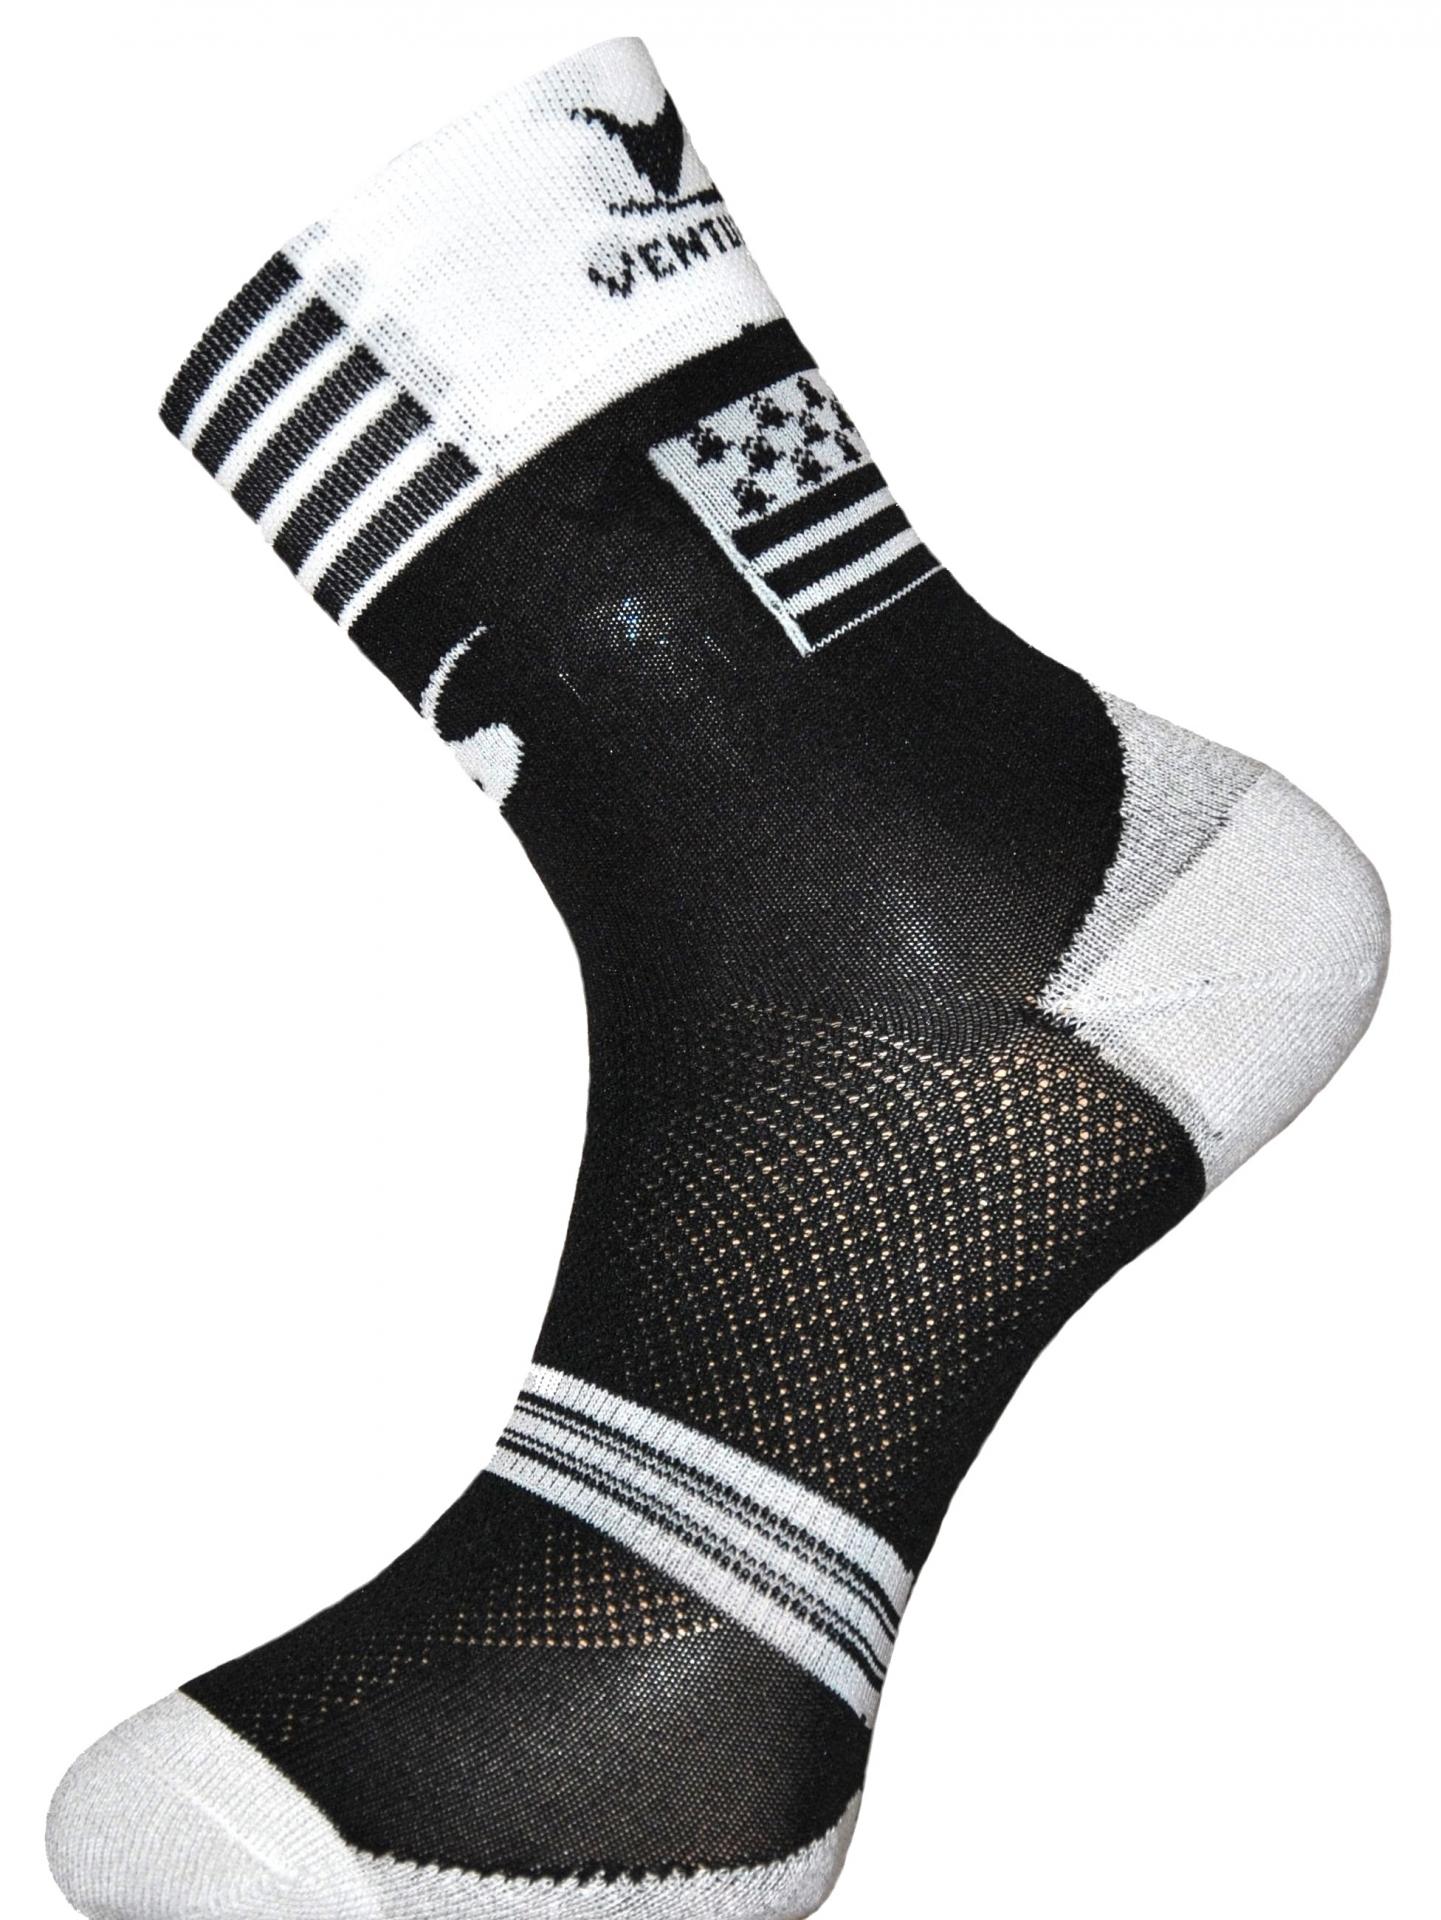 Chaussettes Ventura Socks Carbone Région Bretagne - 35/38